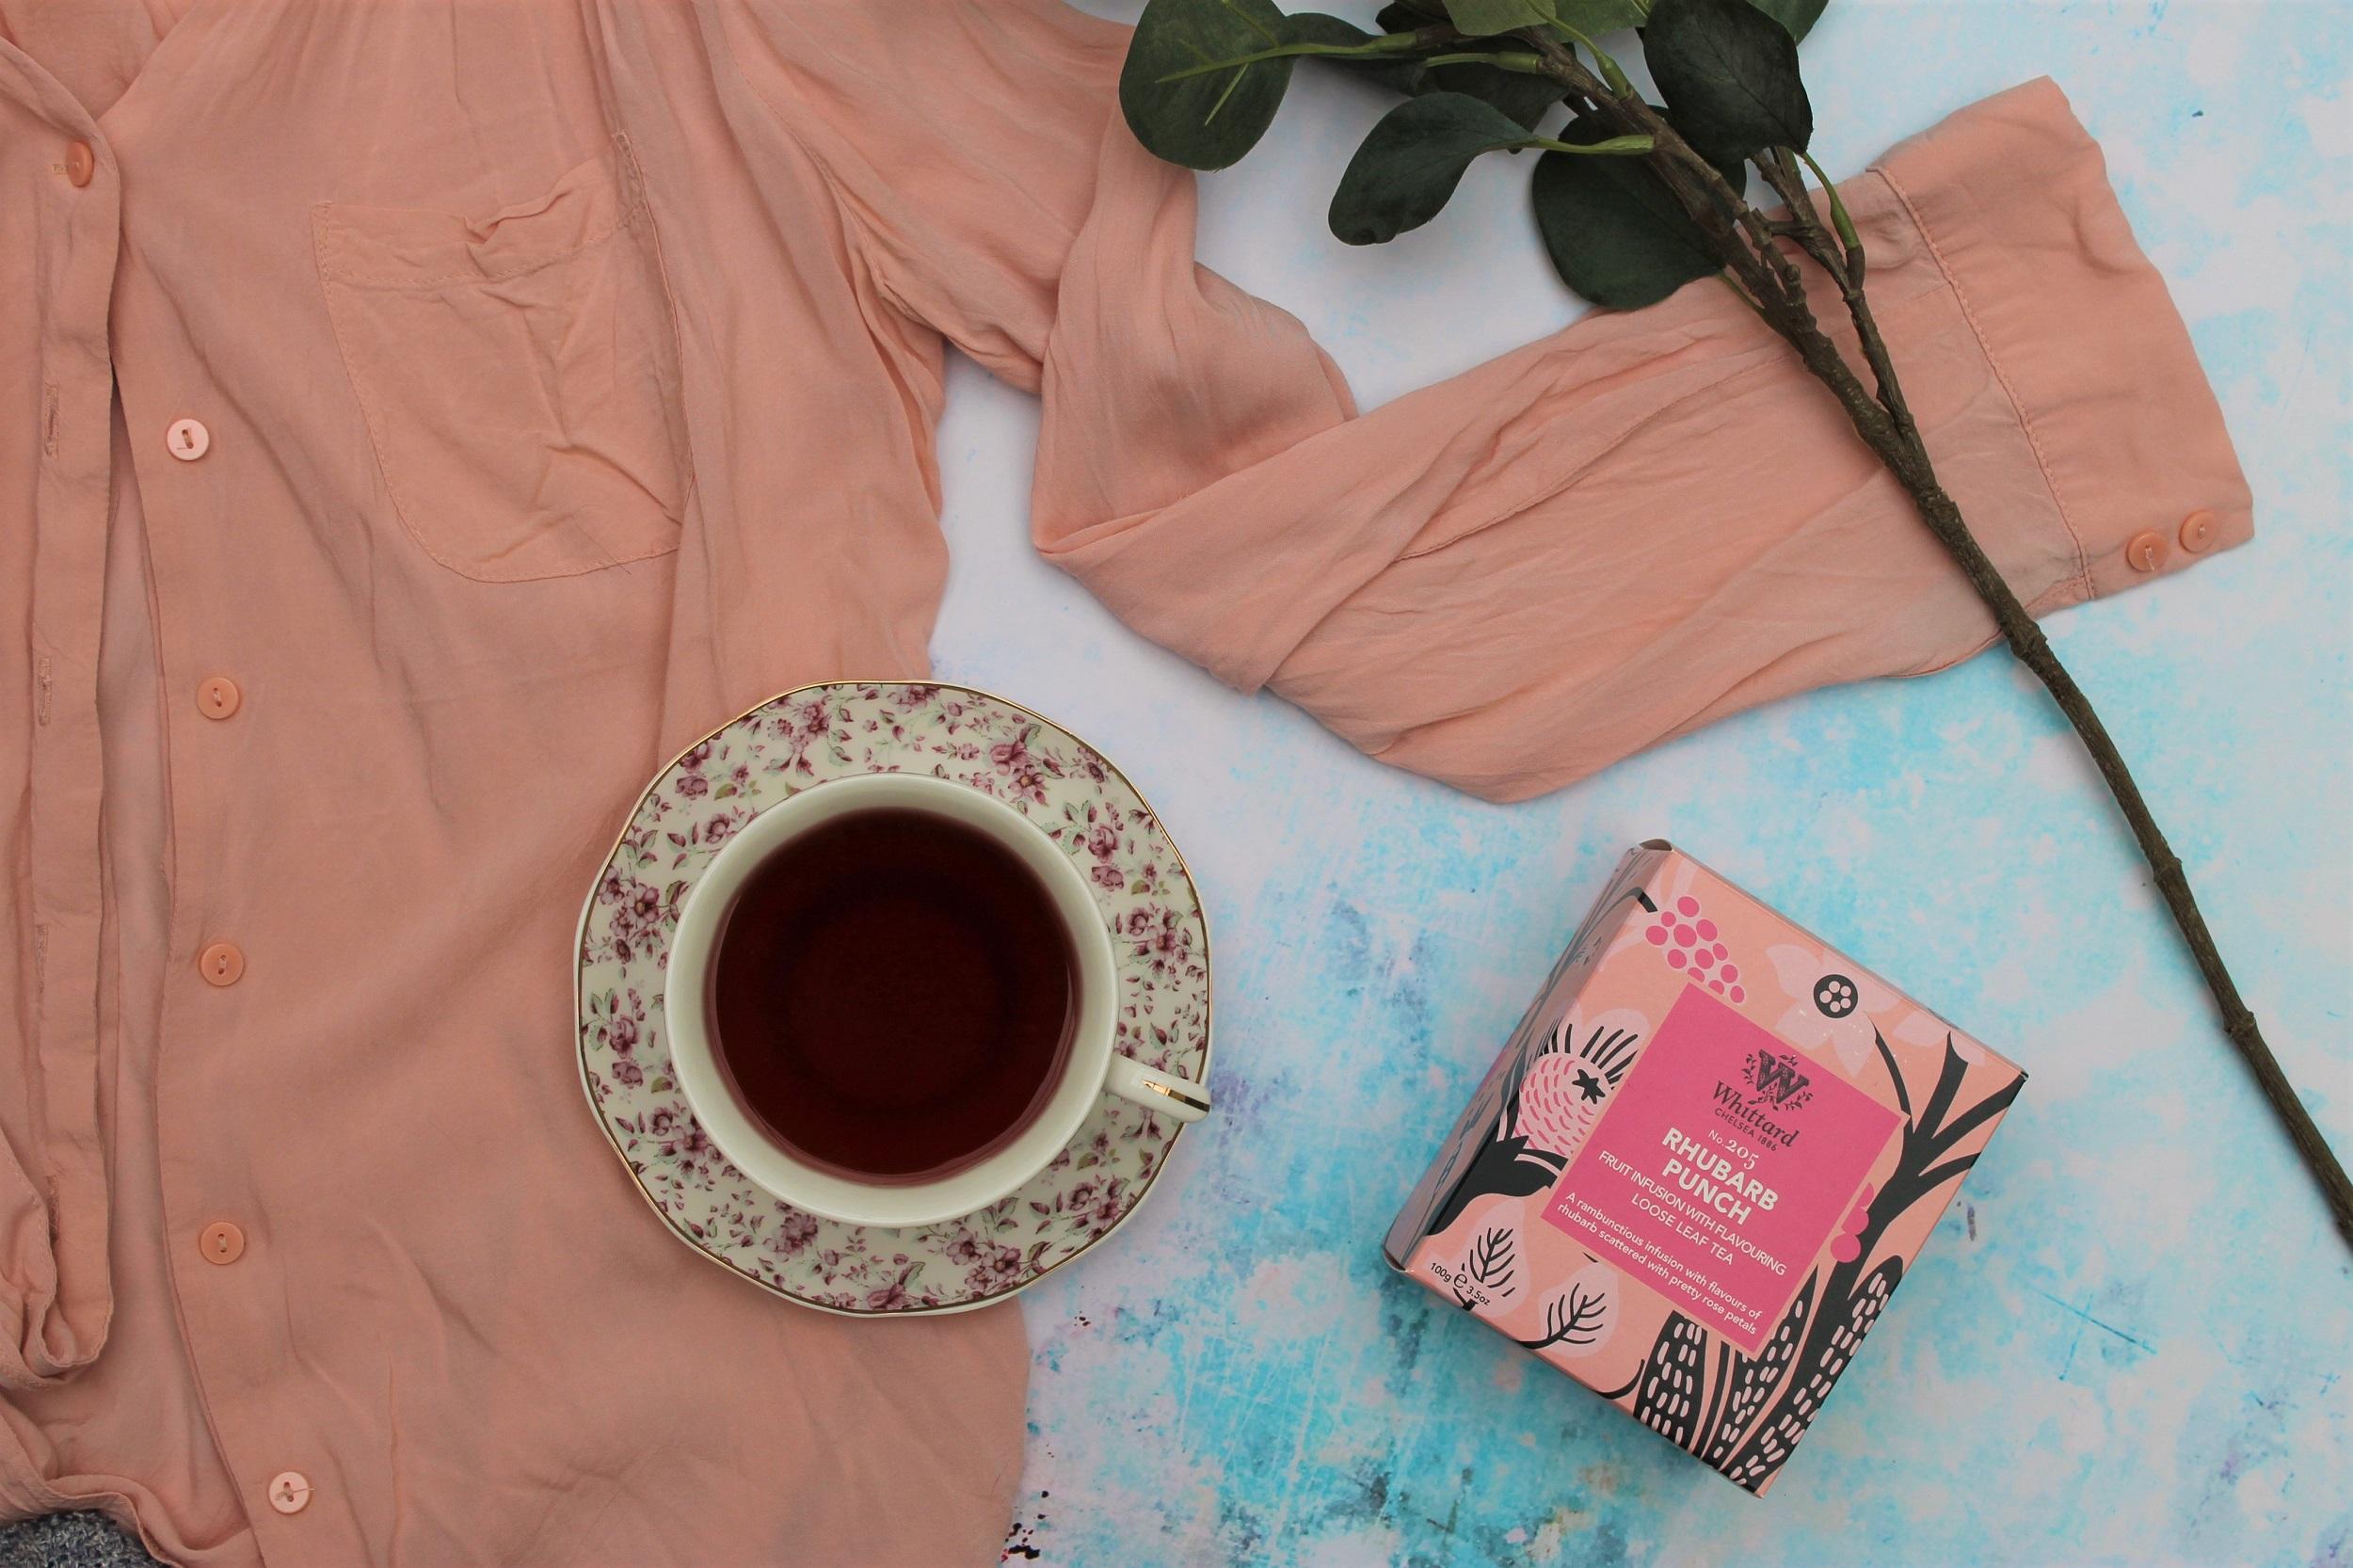 Whittard Rhubarb Punch Fruit Tea Review